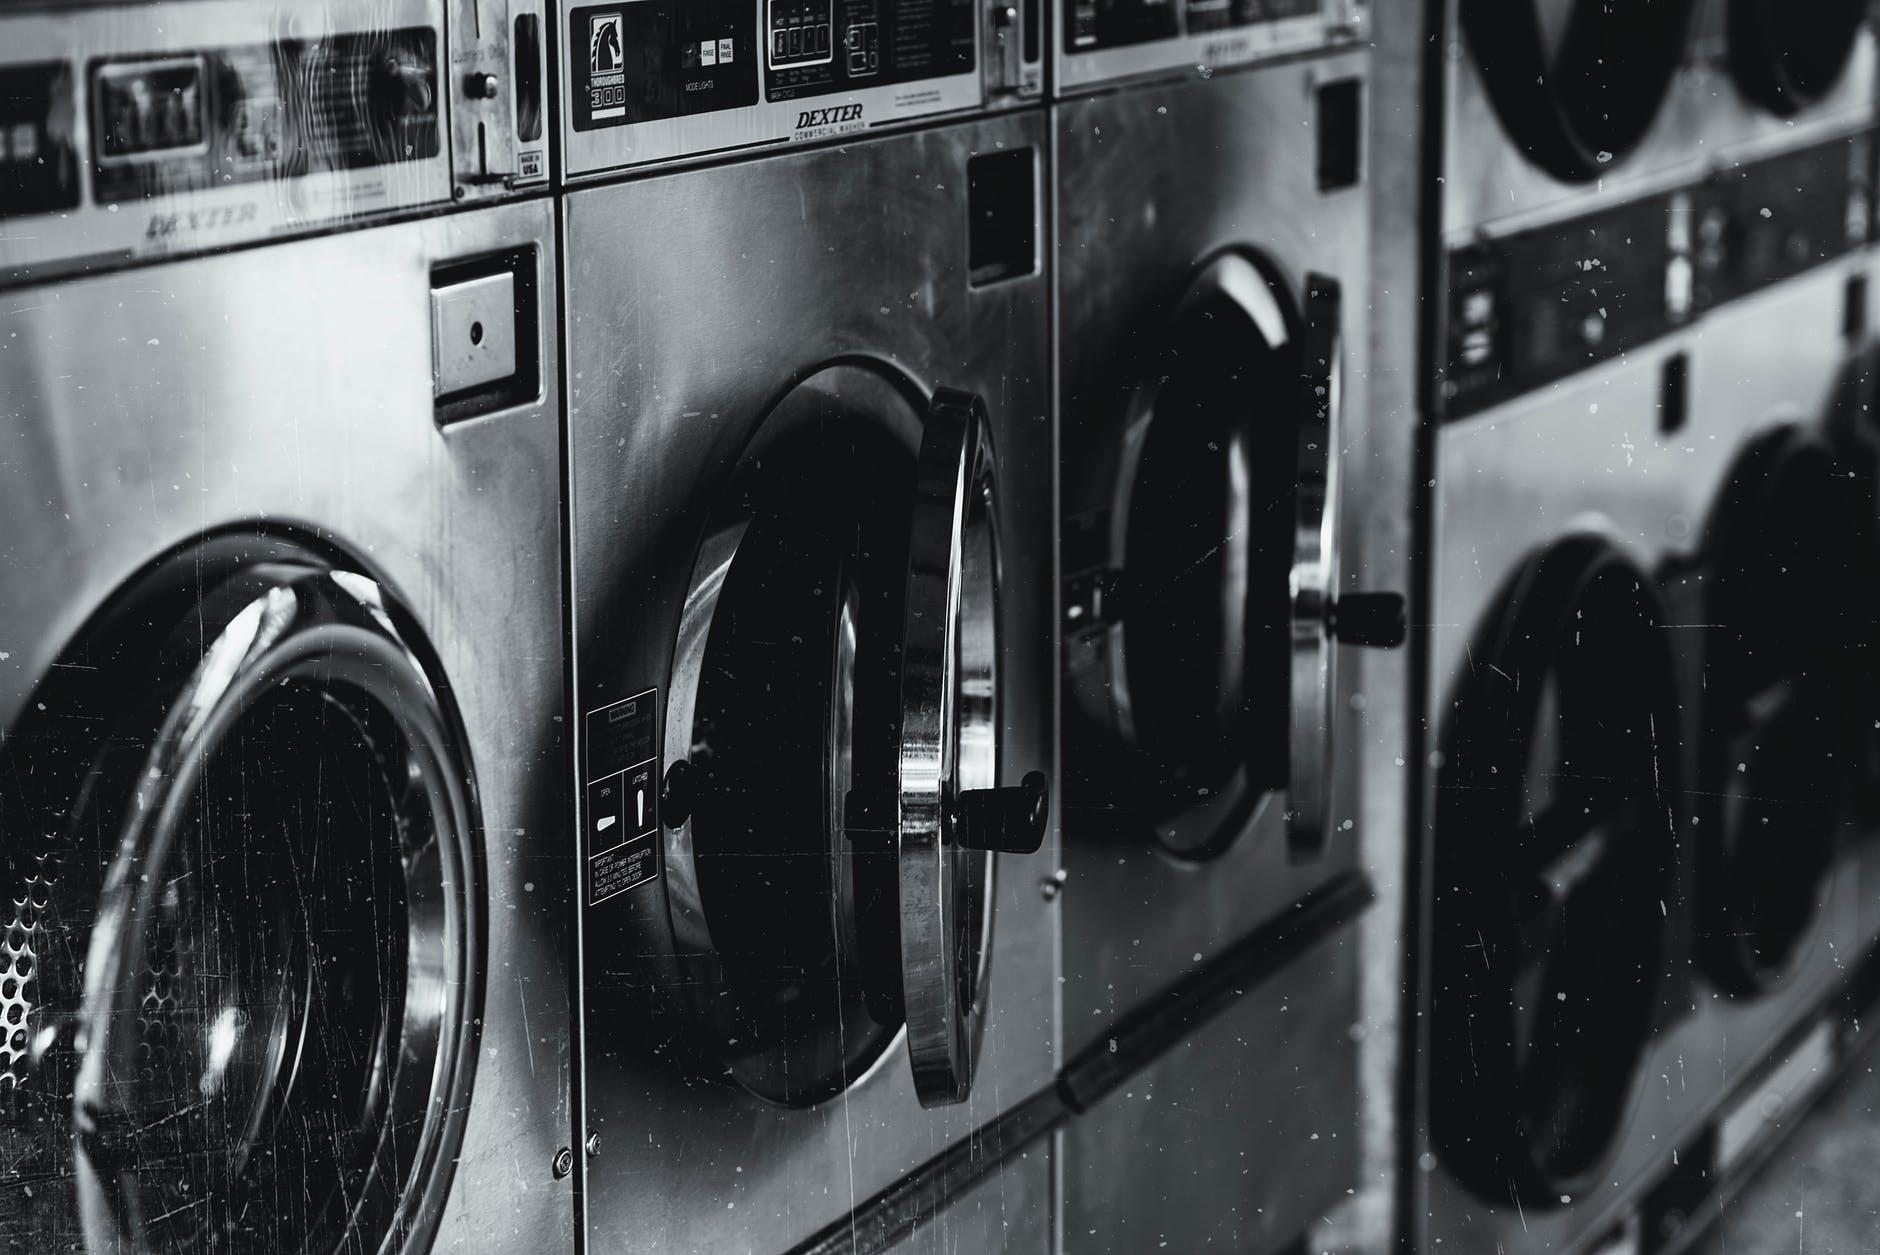 grayscale photo of washing machine